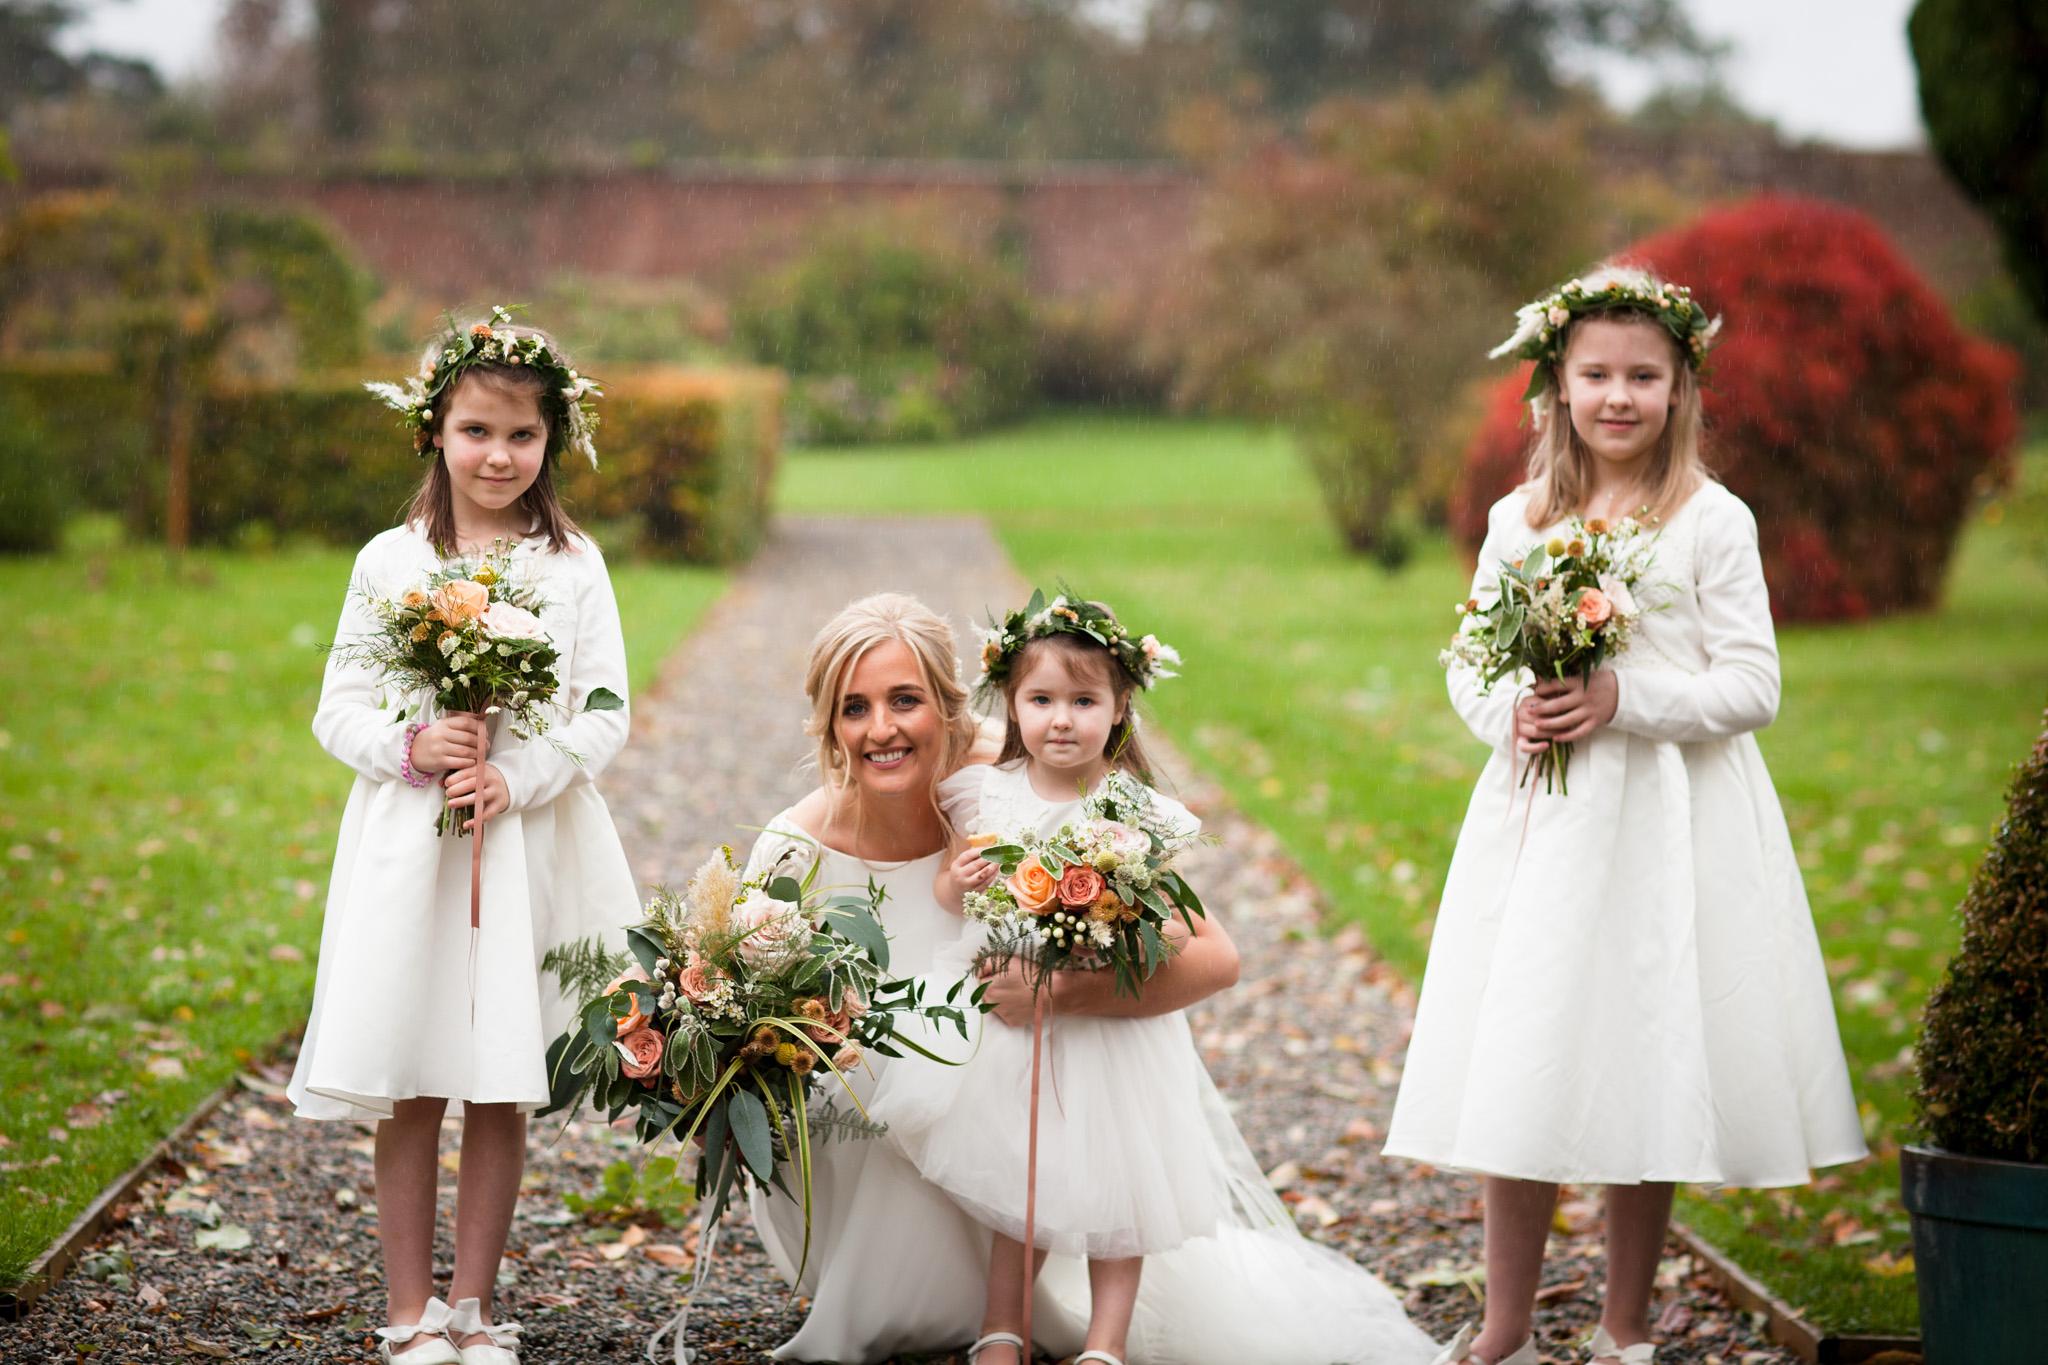 Mark_Barnes_Northern_Ireland_Wedding_Photography_Ballyscullion_Park_Wedding_Photography_Stef&Bobby-42.jpg